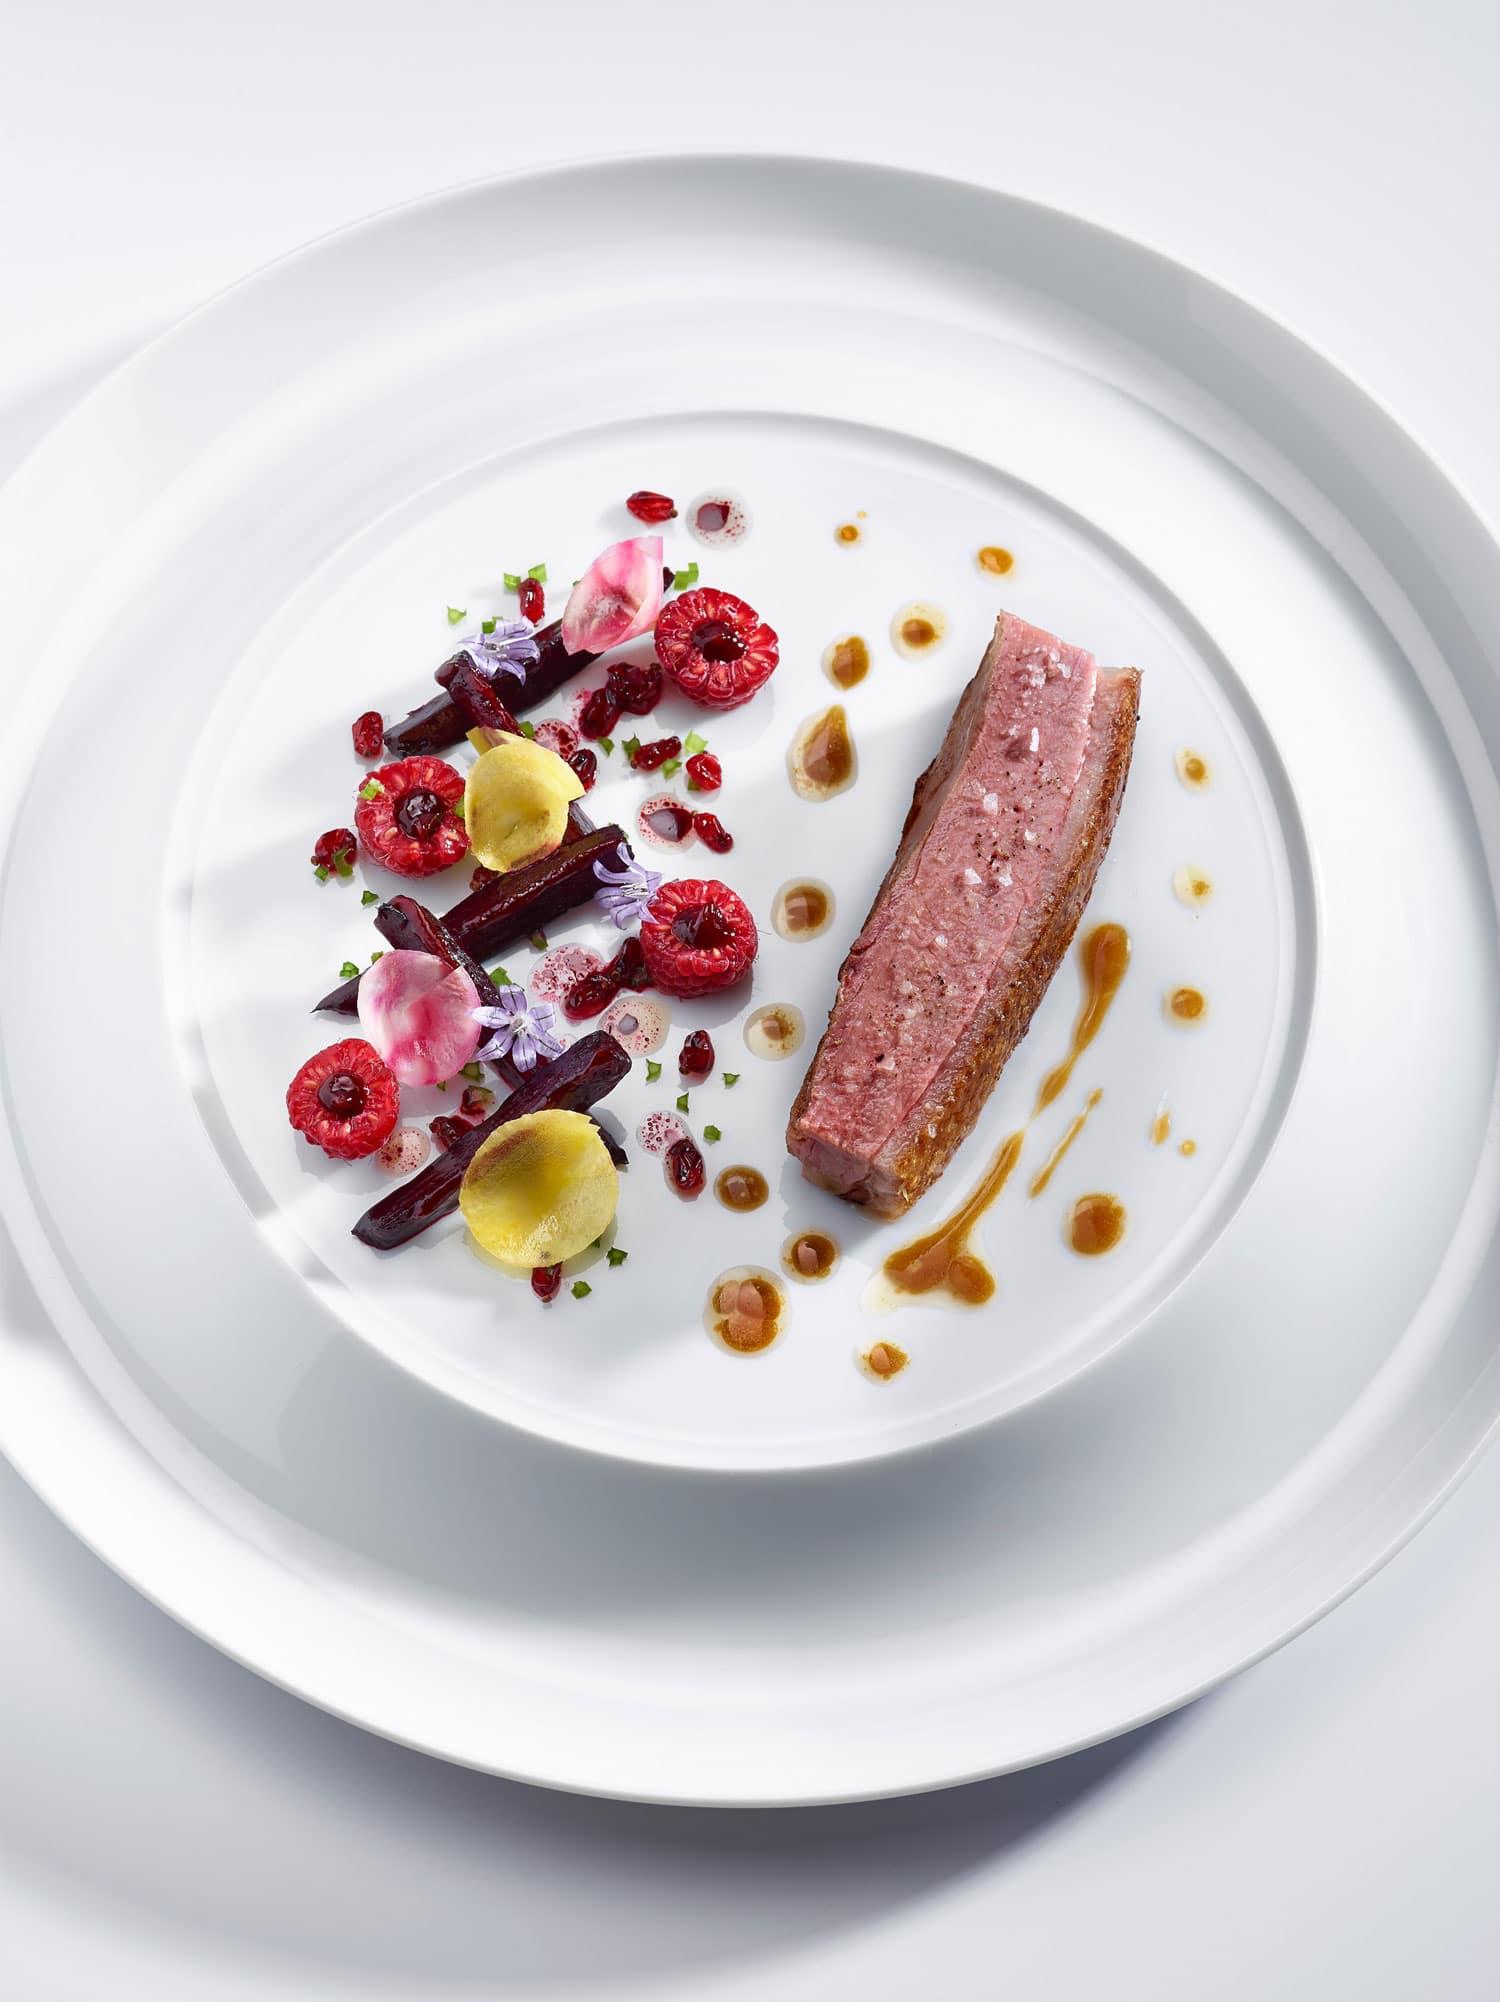 Beau Menus Restaurant Rivage